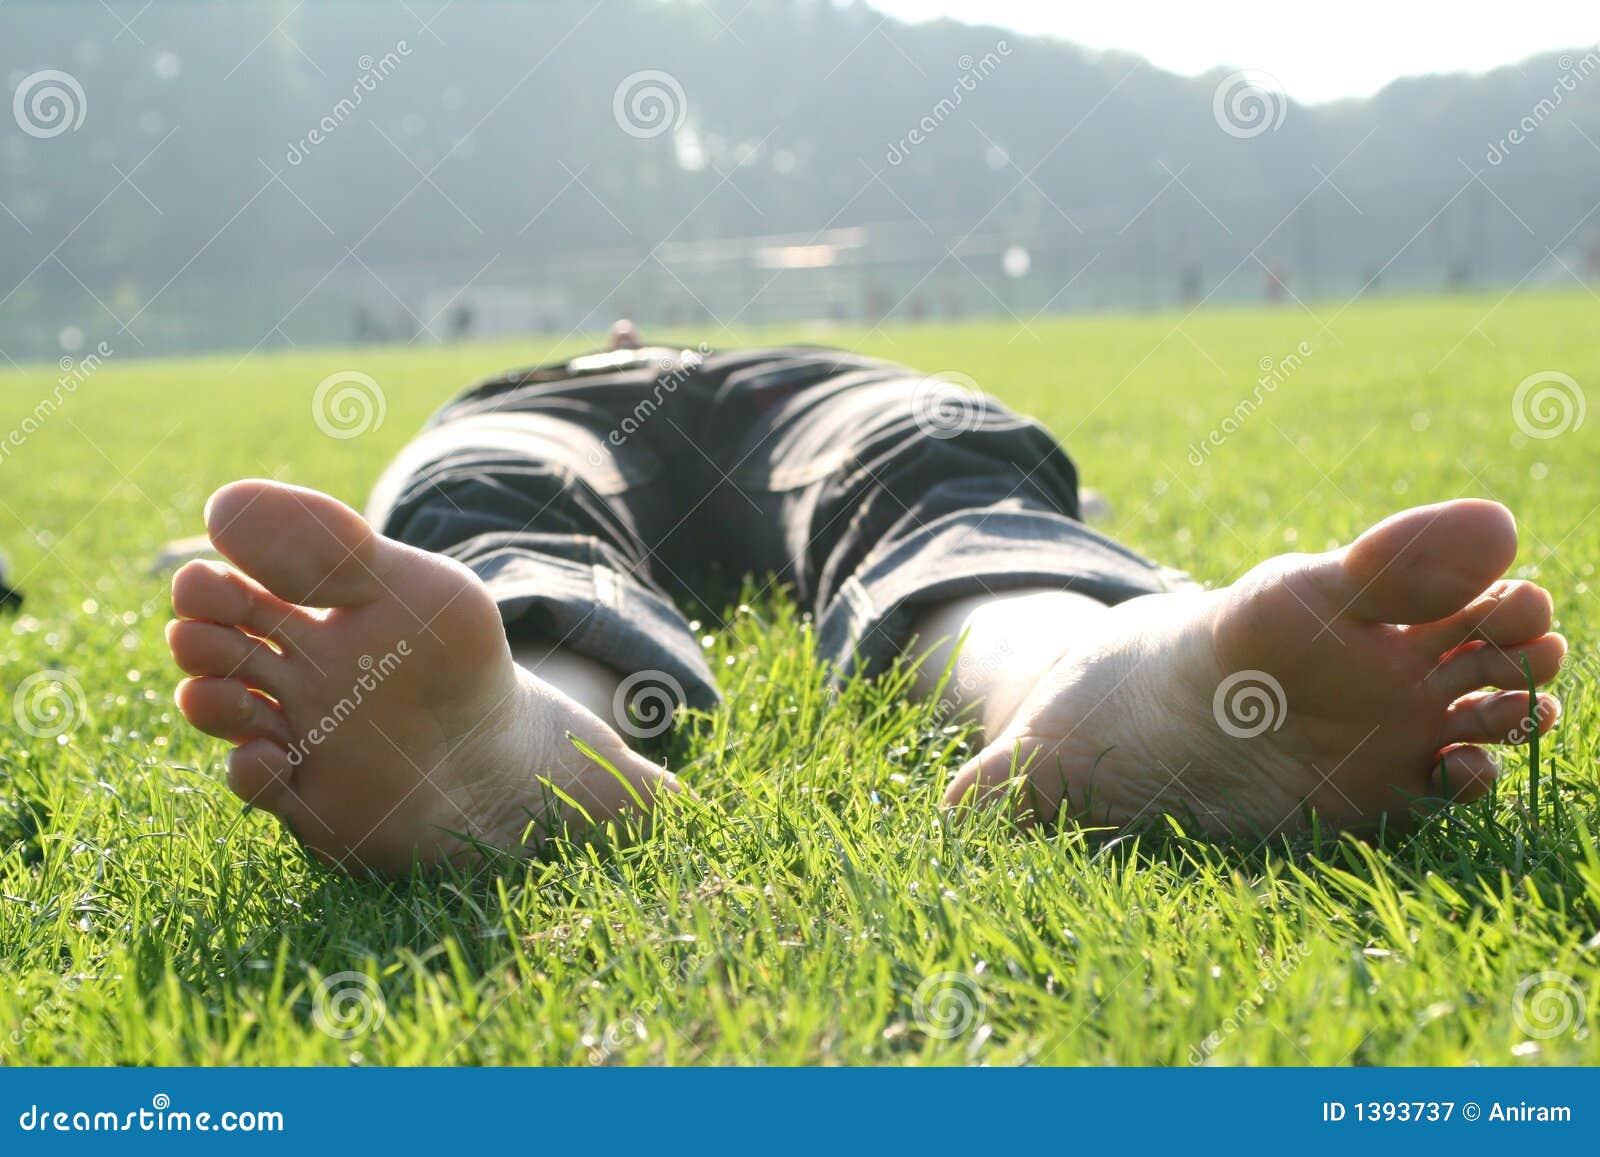 https://thumbs.dreamstime.com/z/grass-1393737.jpg